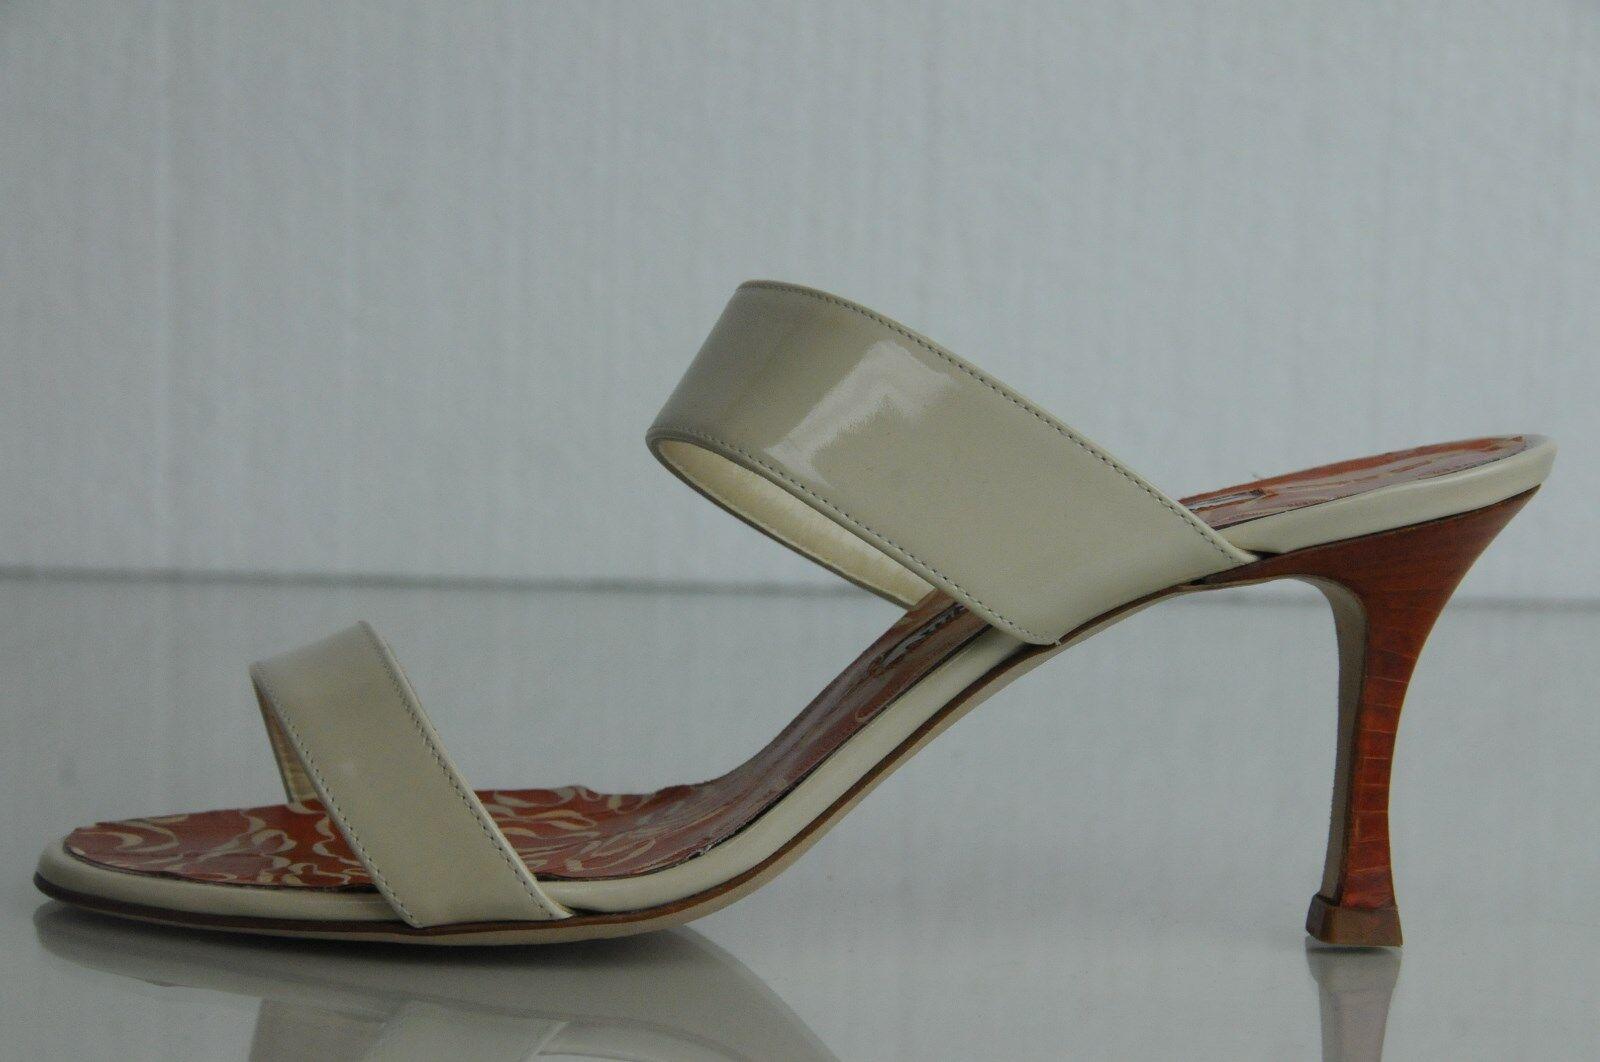 845 New New New Manolo Blahnik Nude Beige Patent Orange Cream EEL Sandals schuhe 37 299e74